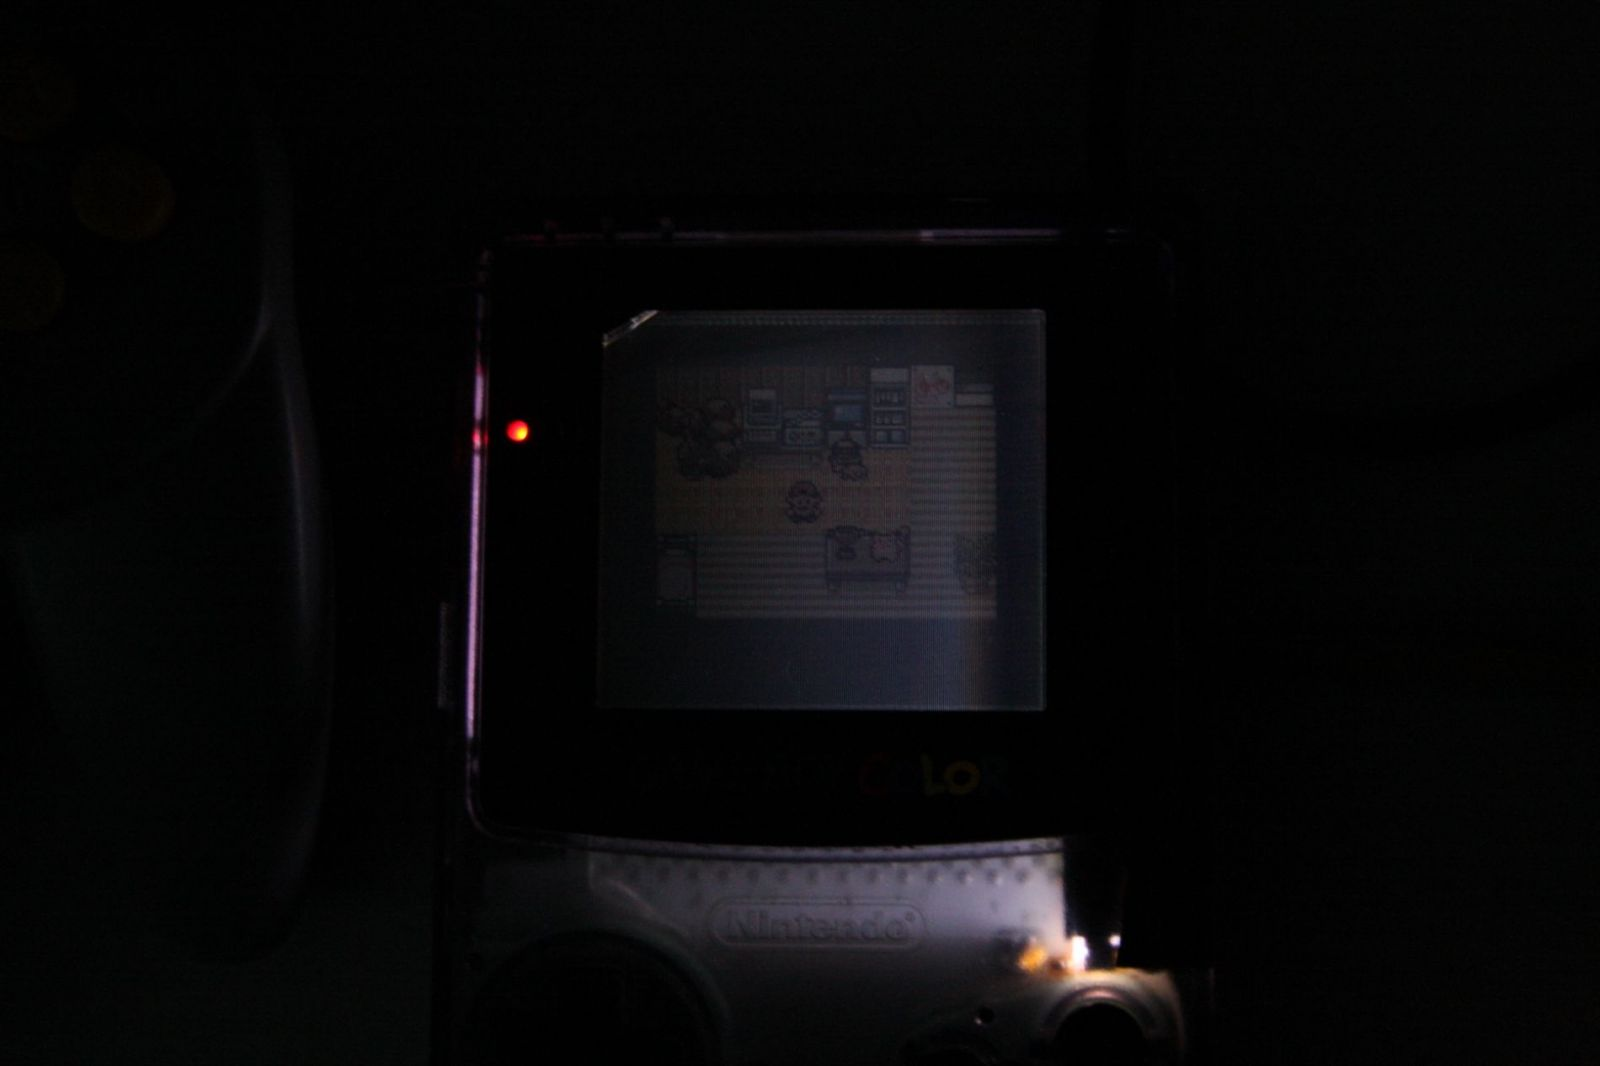 Frontlit Gameboy 1